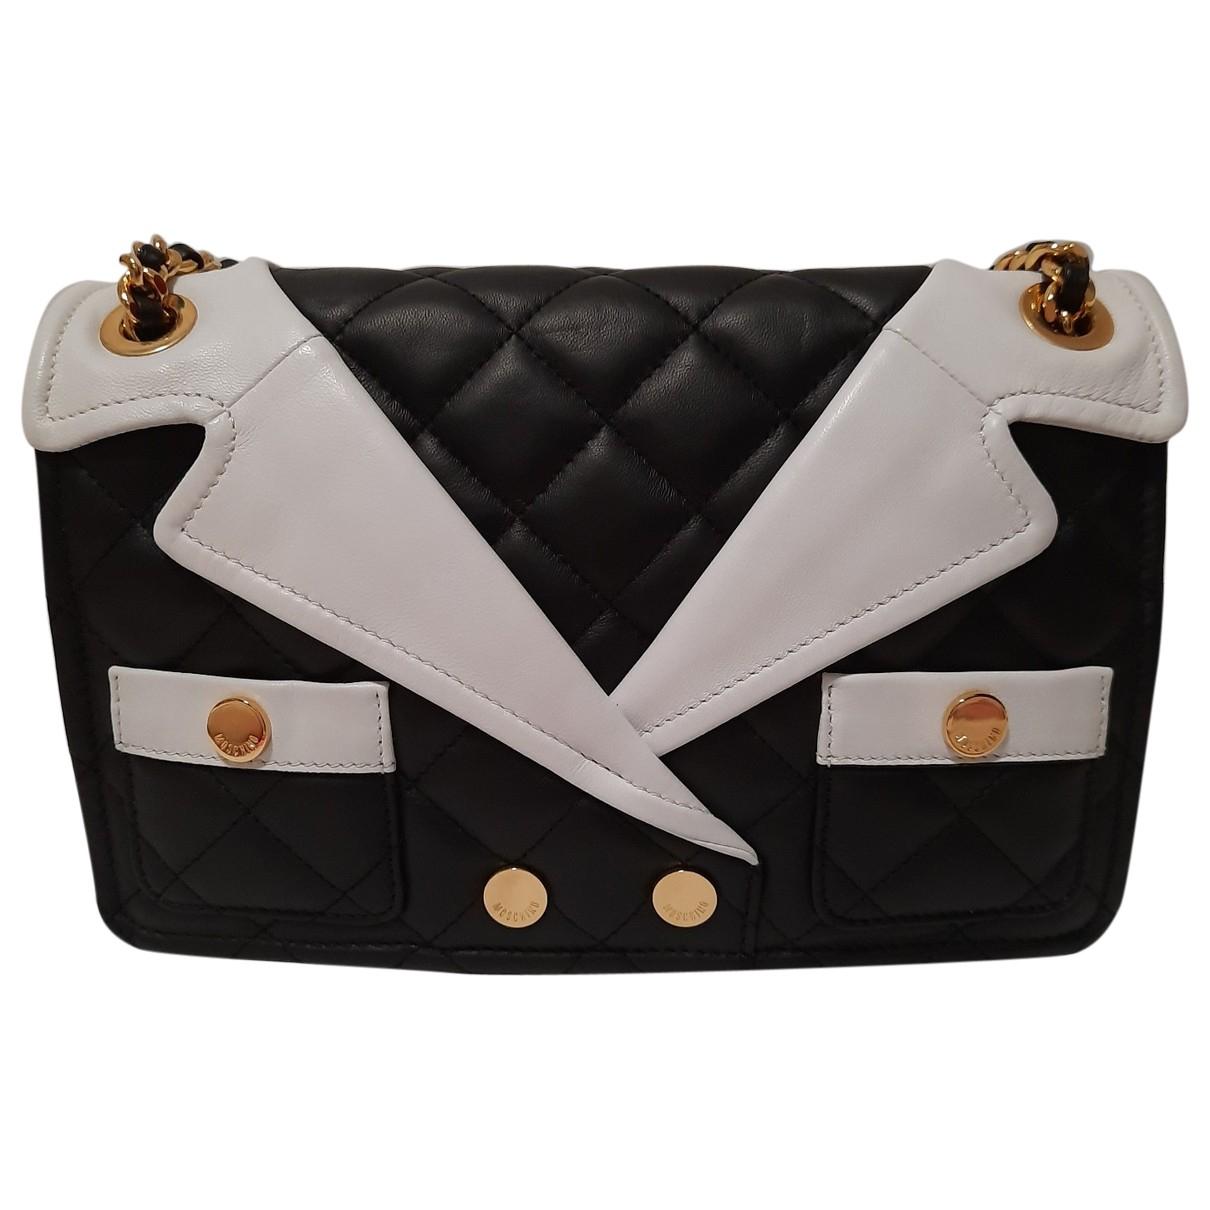 Moschino \N Black Leather handbag for Women \N